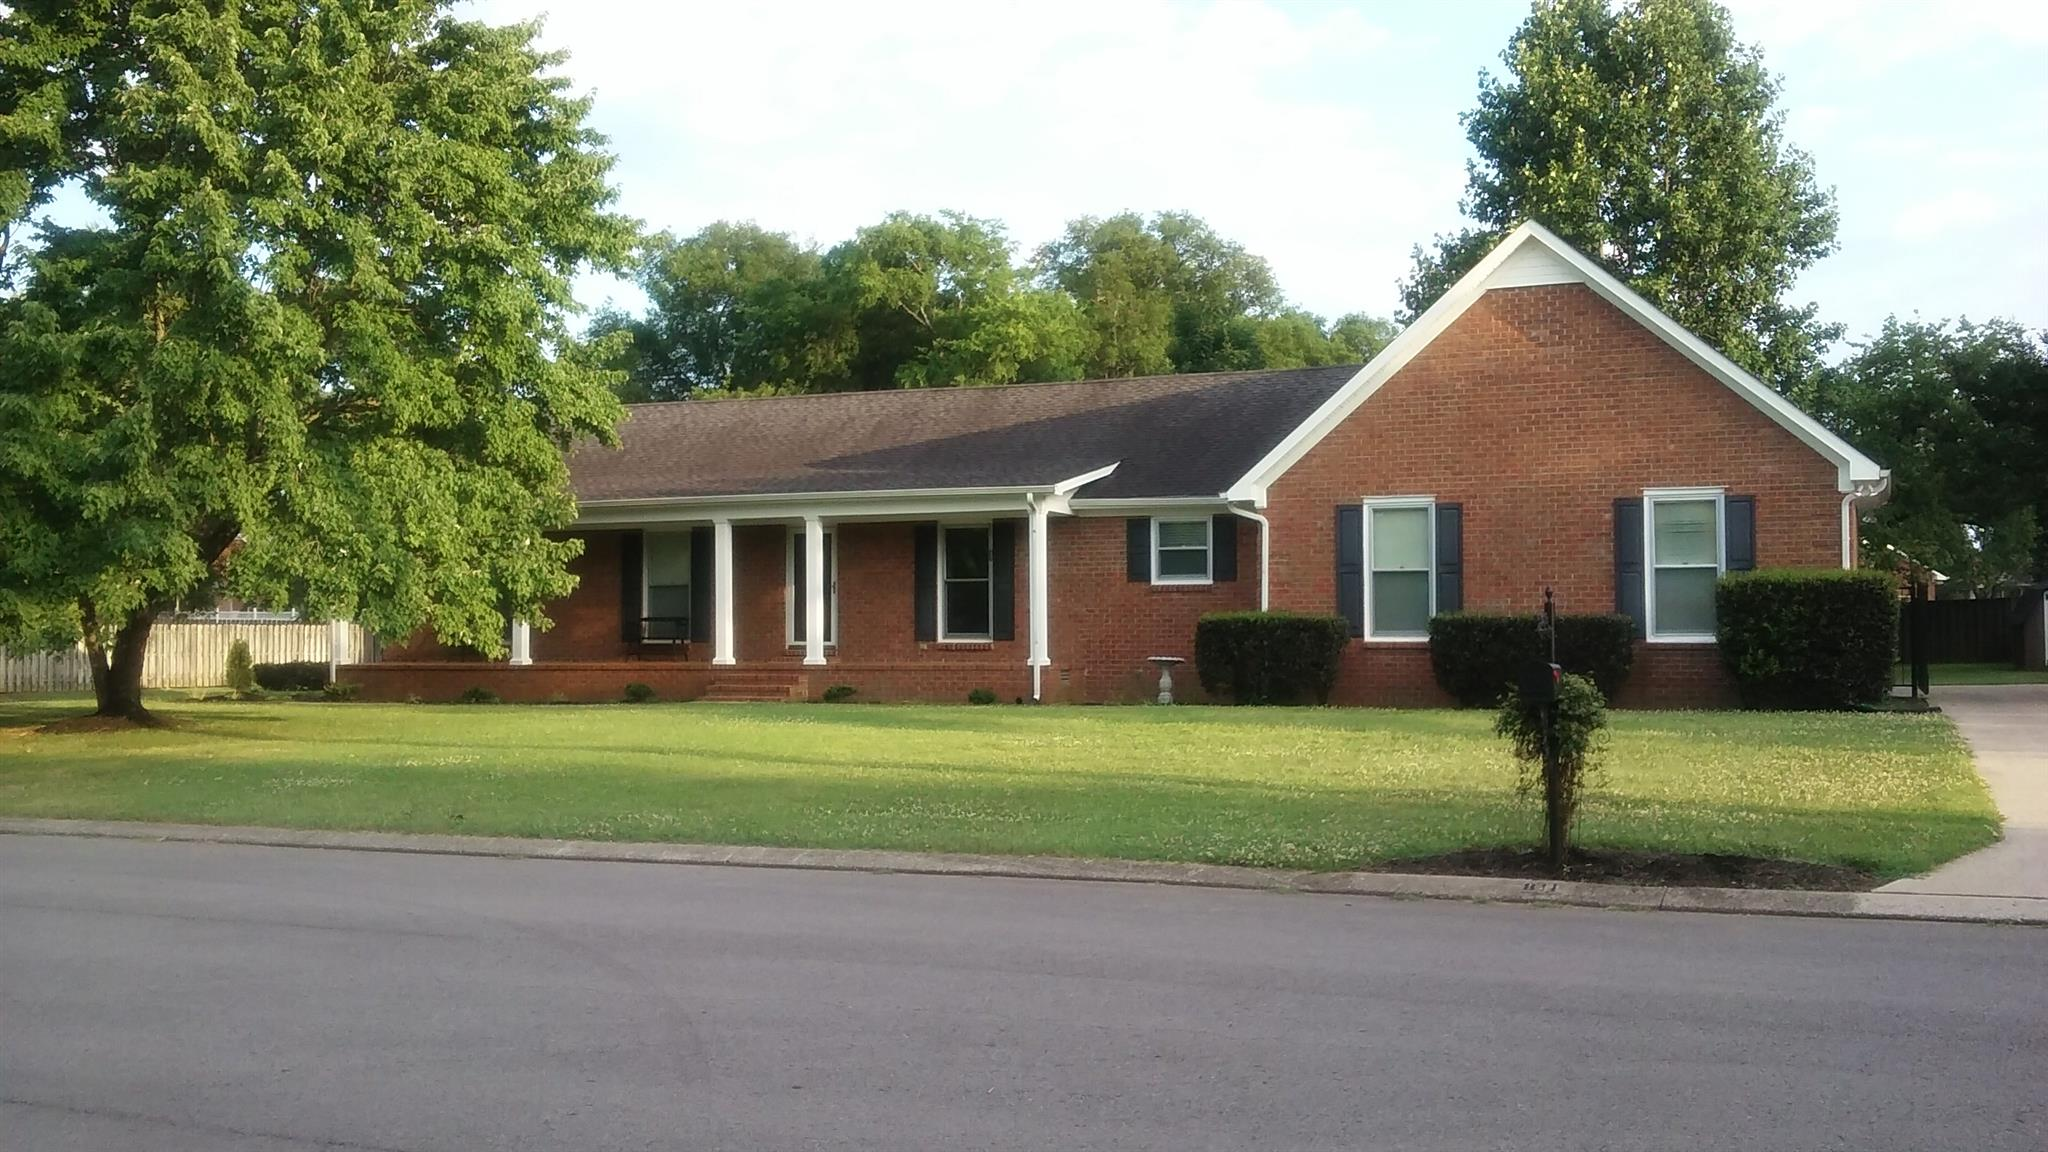 811 Banner Dr, Murfreesboro, TN 37129